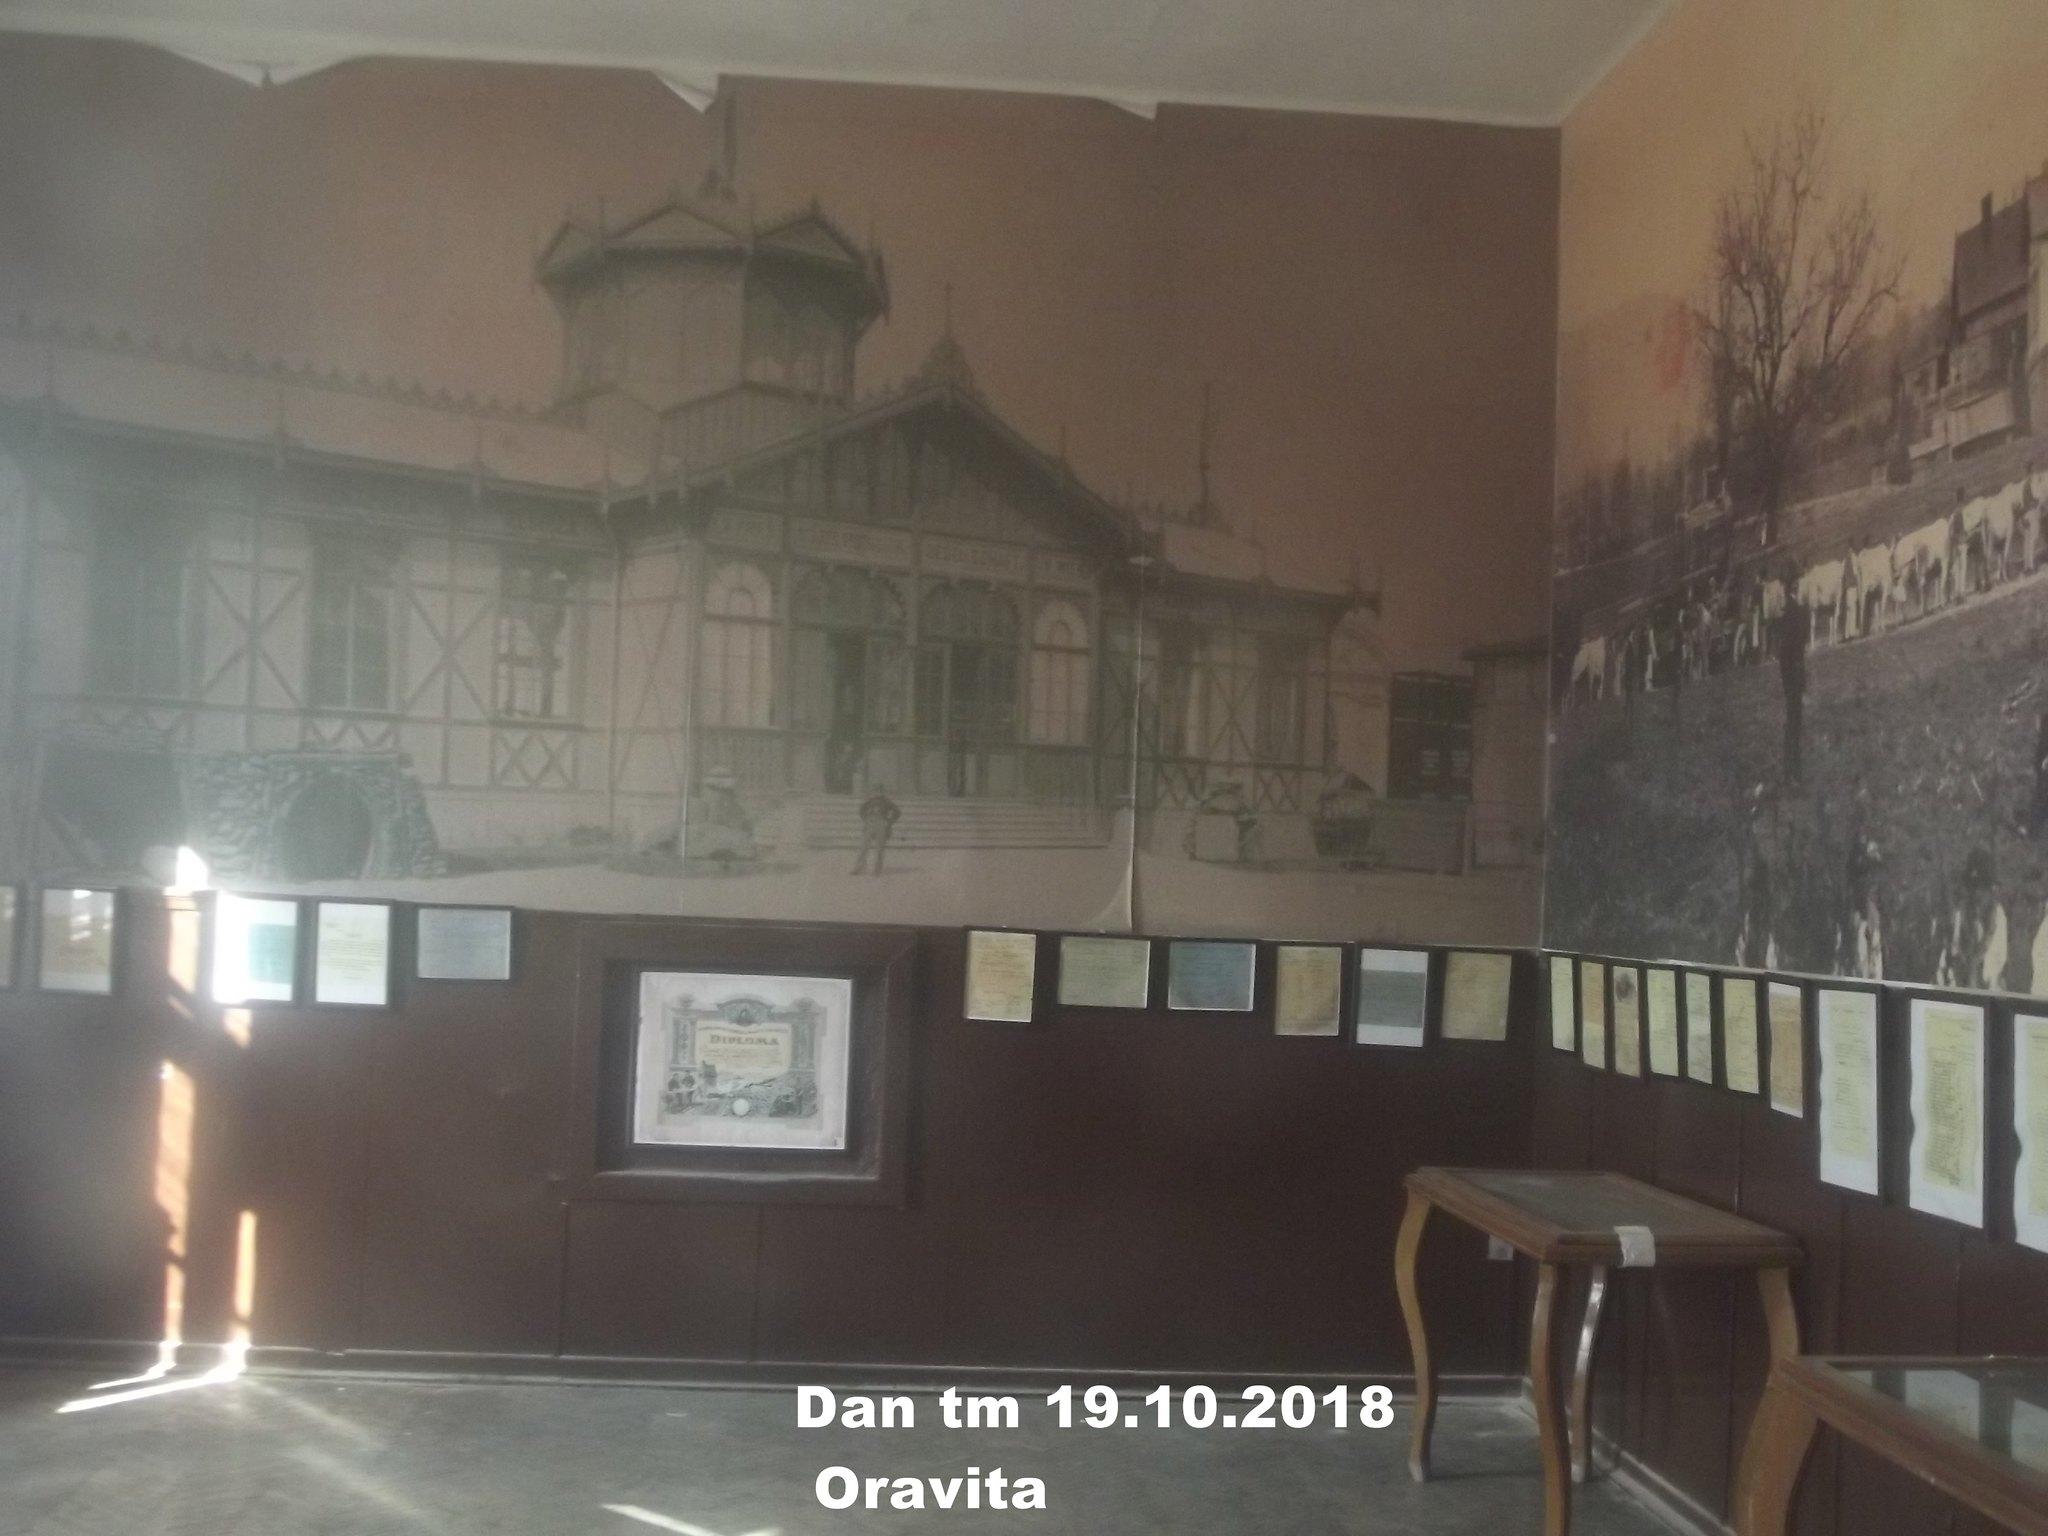 925 : Oravita - Anina - Pagina 40 45419430662_31a91c7d0c_k